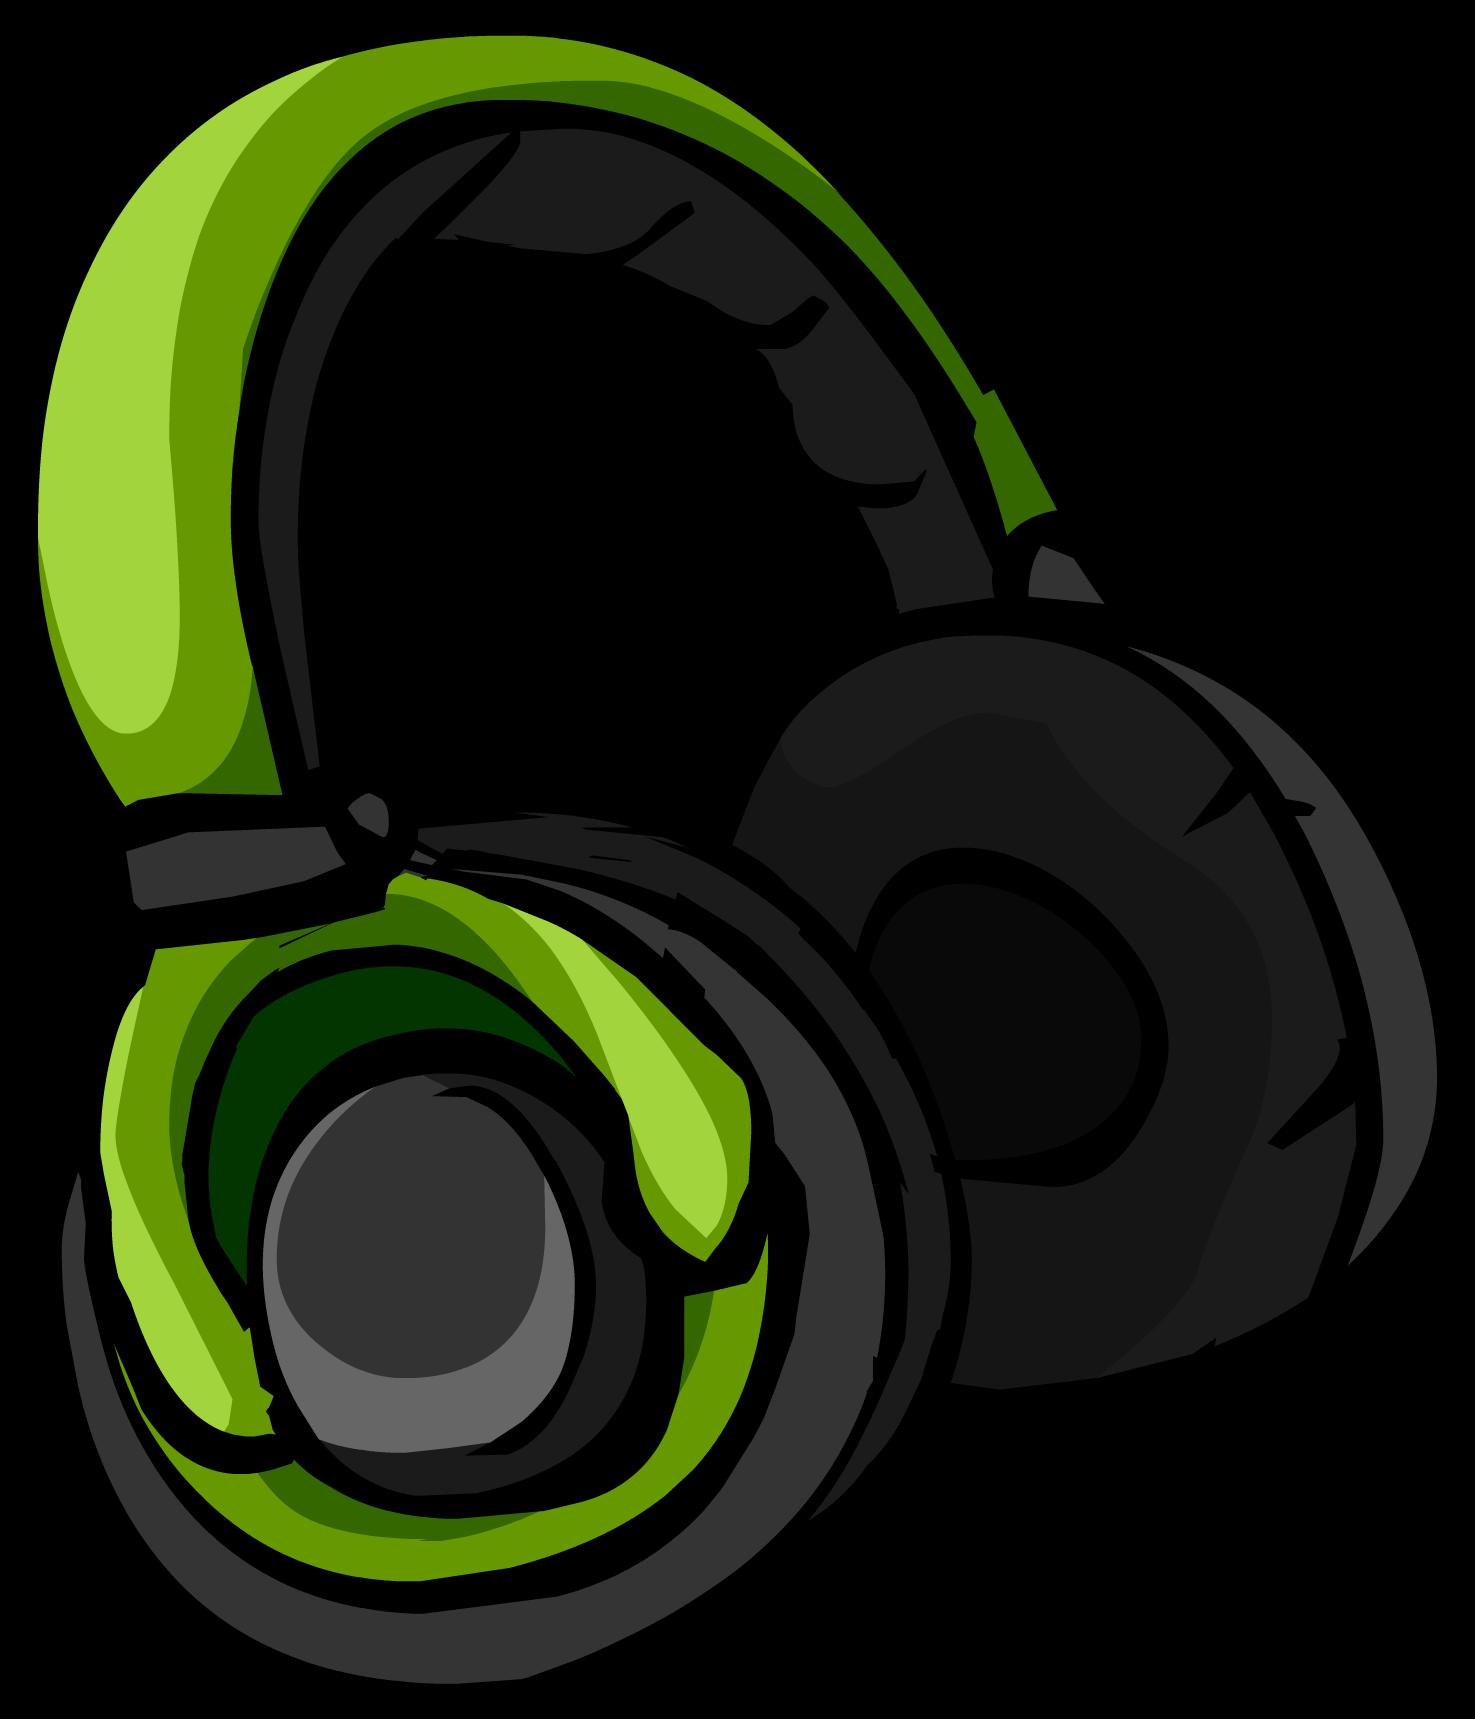 Green Headphones Club Penguin Wiki Fandom Powered By Wikia